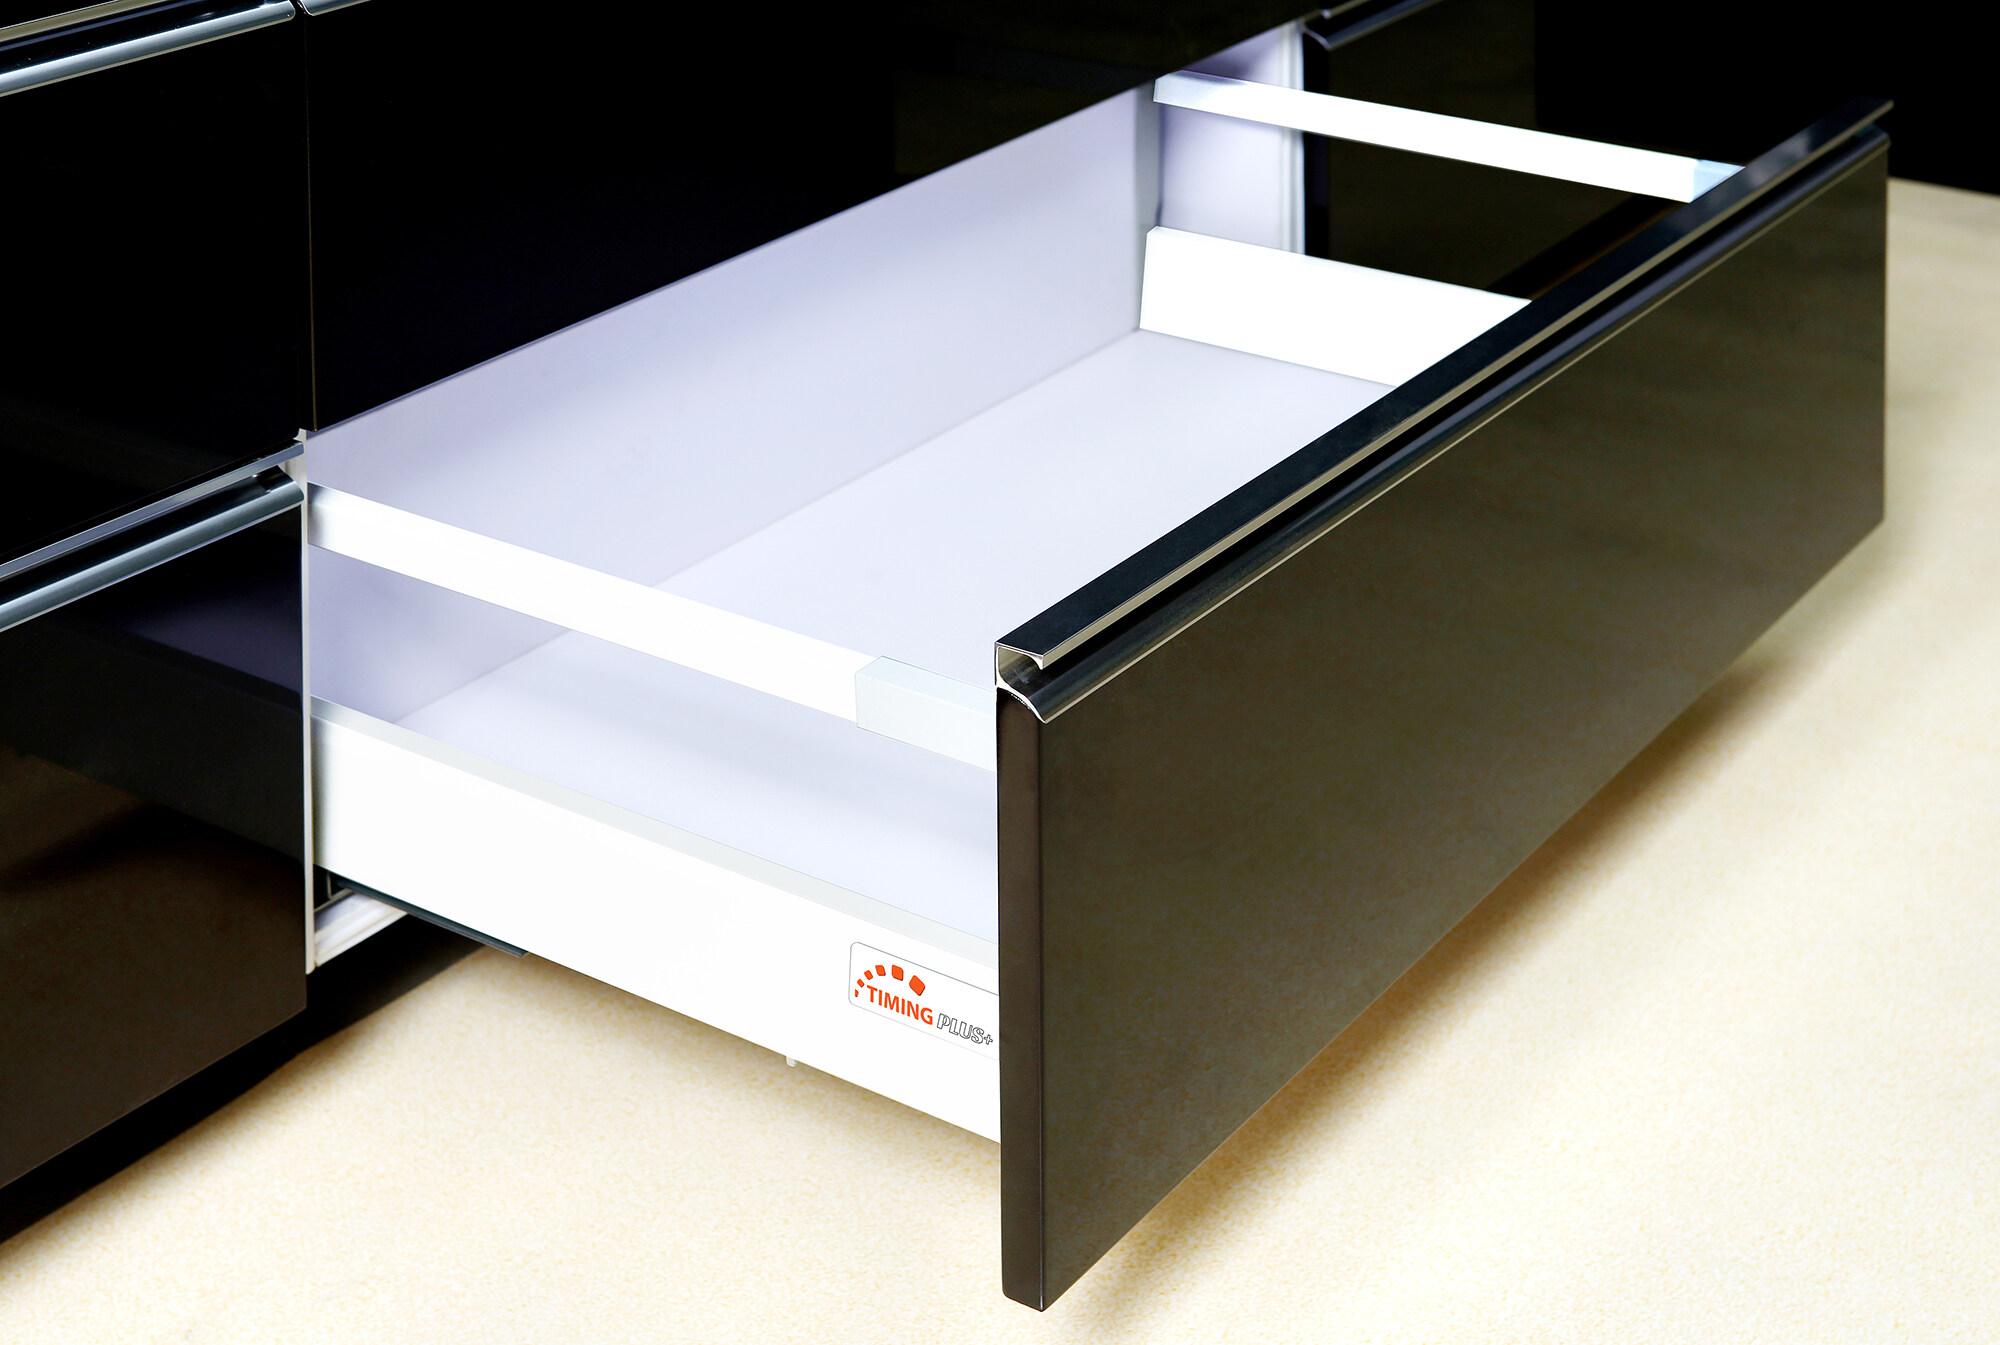 908 Luxury Drawer B199 (Drawer Set System) TM908TB-B199